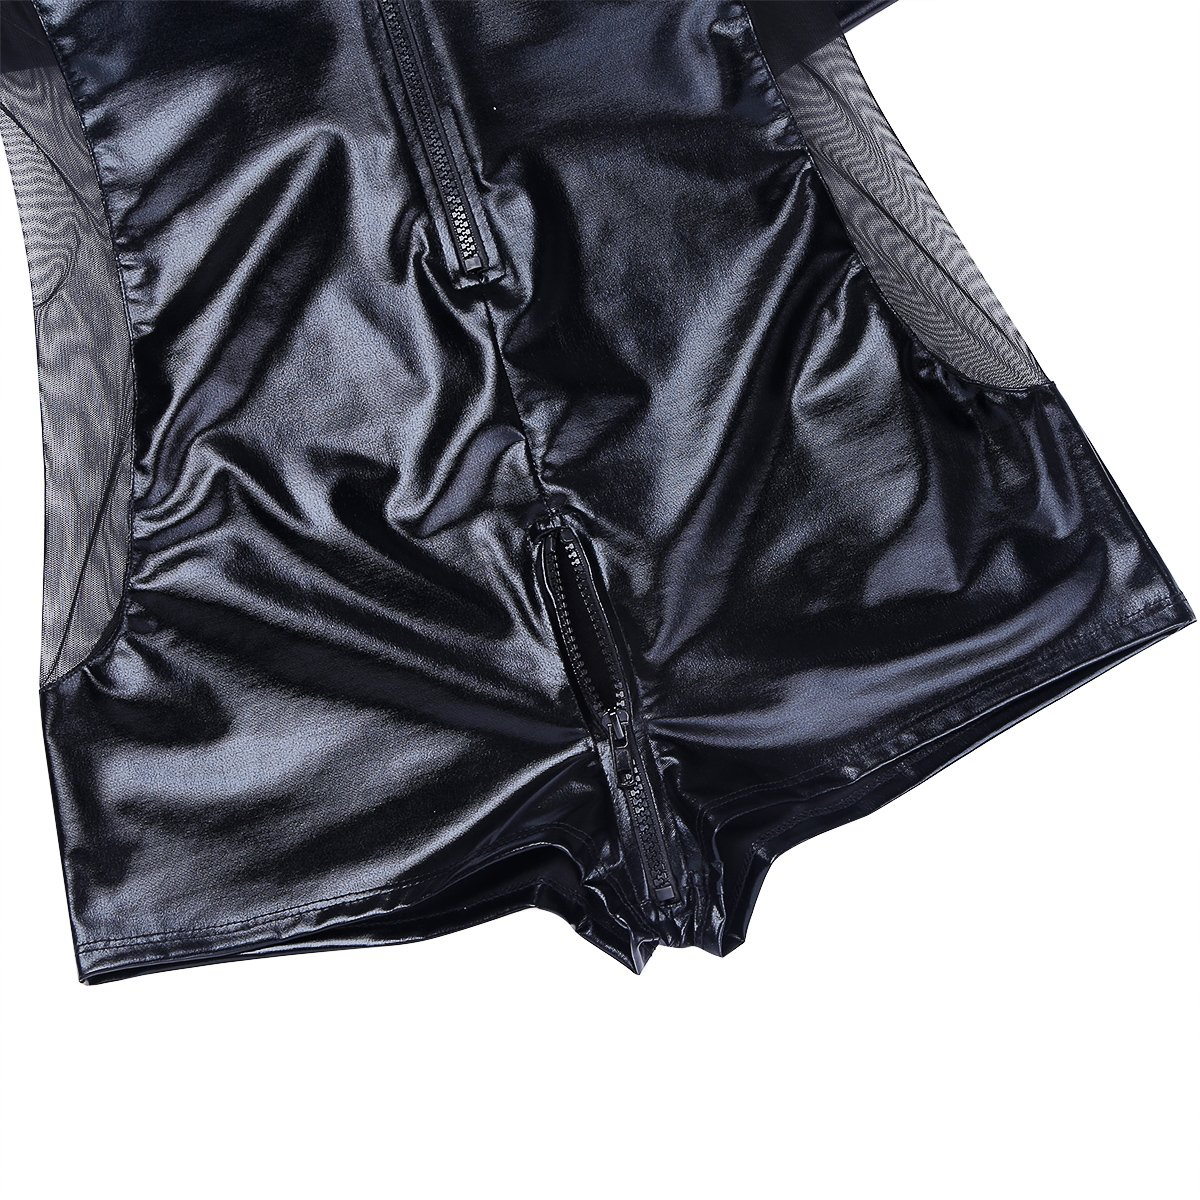 3b6a32005da8 ACSUSS Men s Wetlook Patent Leather Front Zipper One-Piece Bodysuit Leotard  at Amazon Men s Clothing store